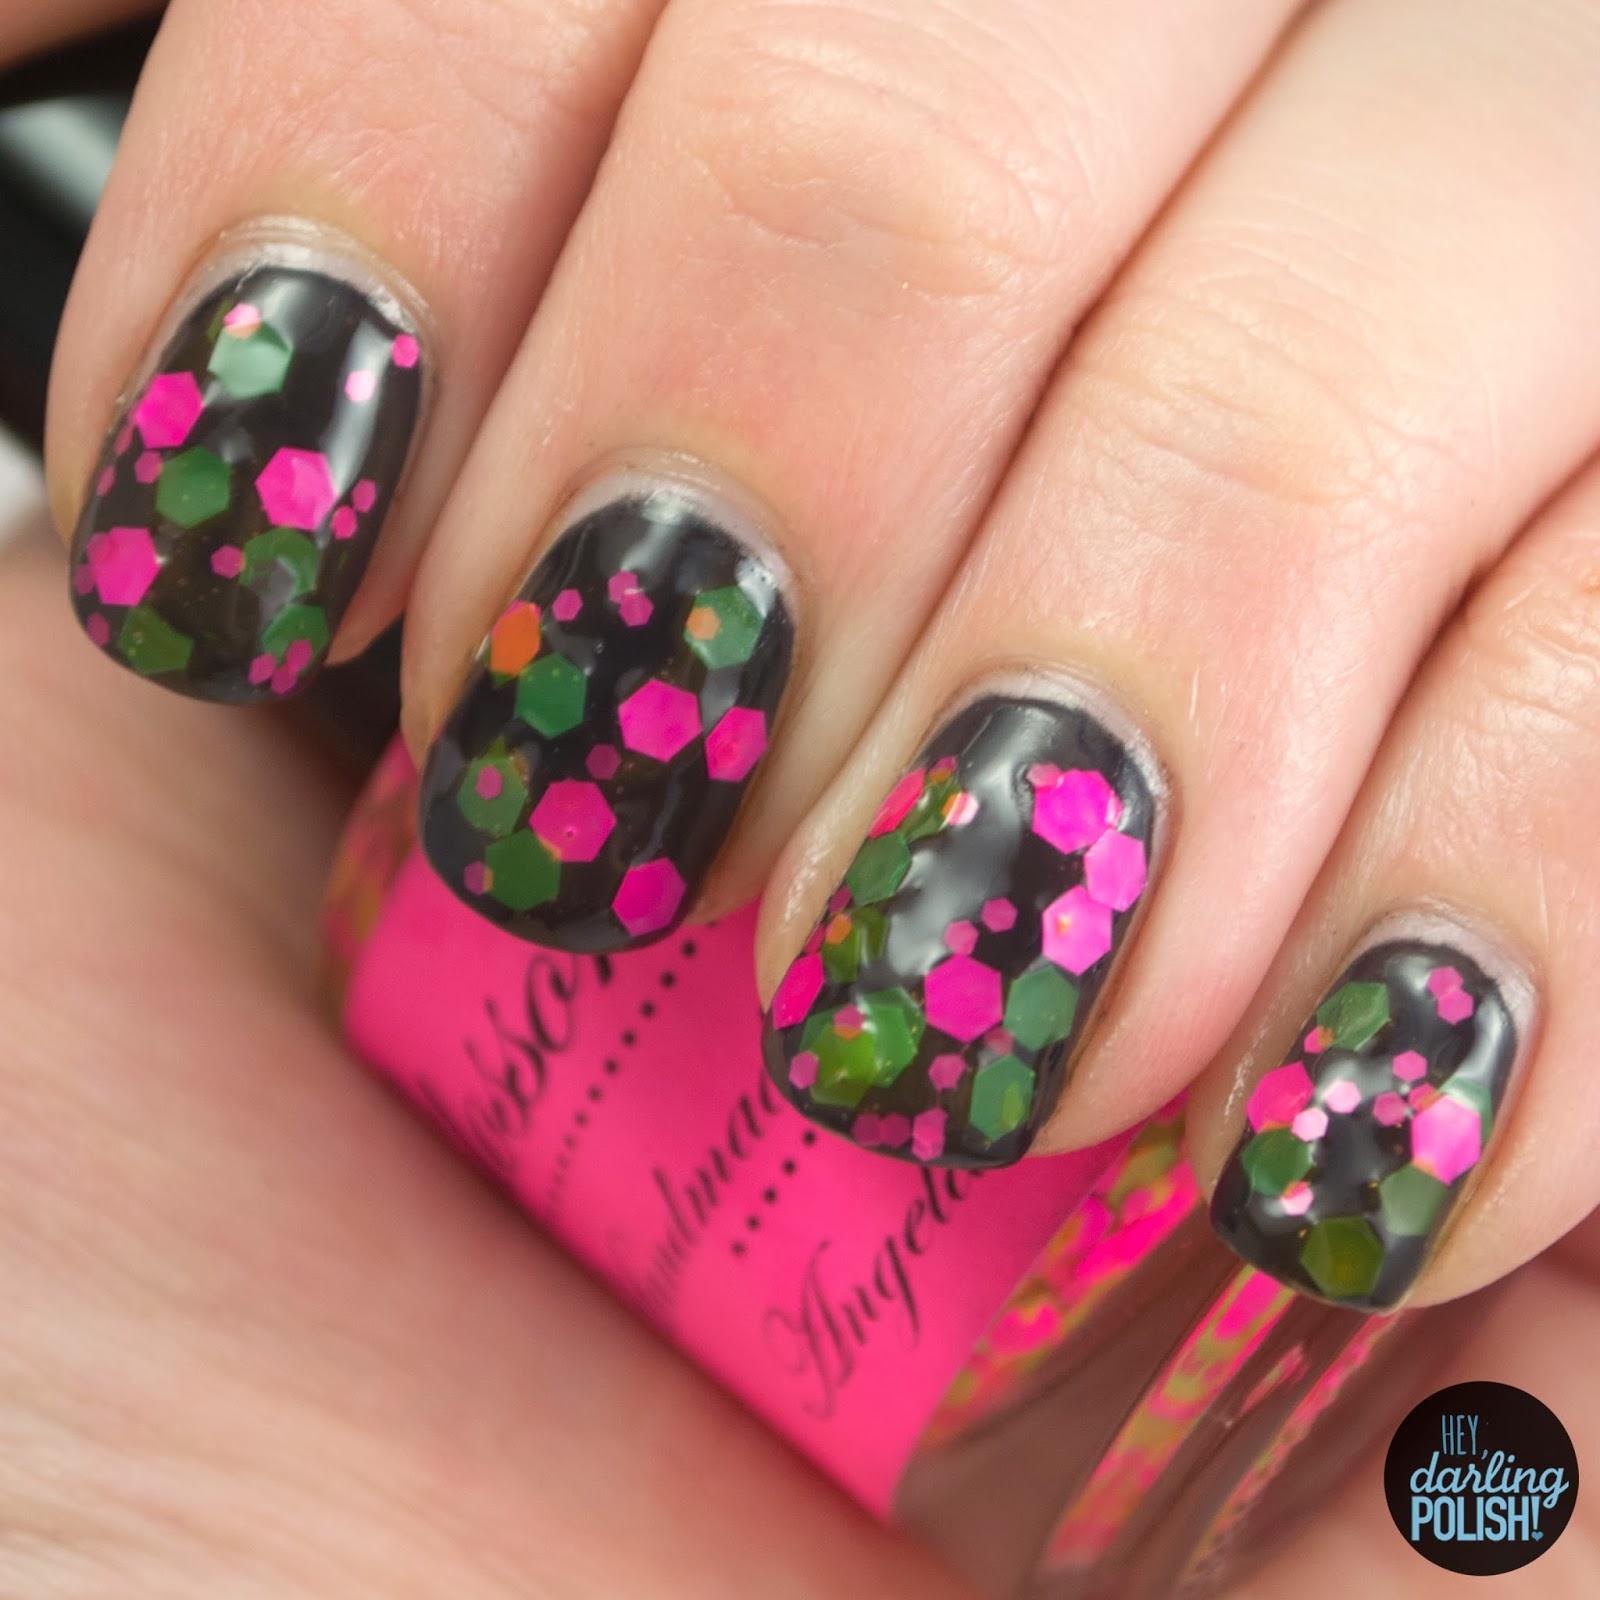 glossome polish, indie, indie polish, indie nail polish, swatch, hey darling polish, i want it, black